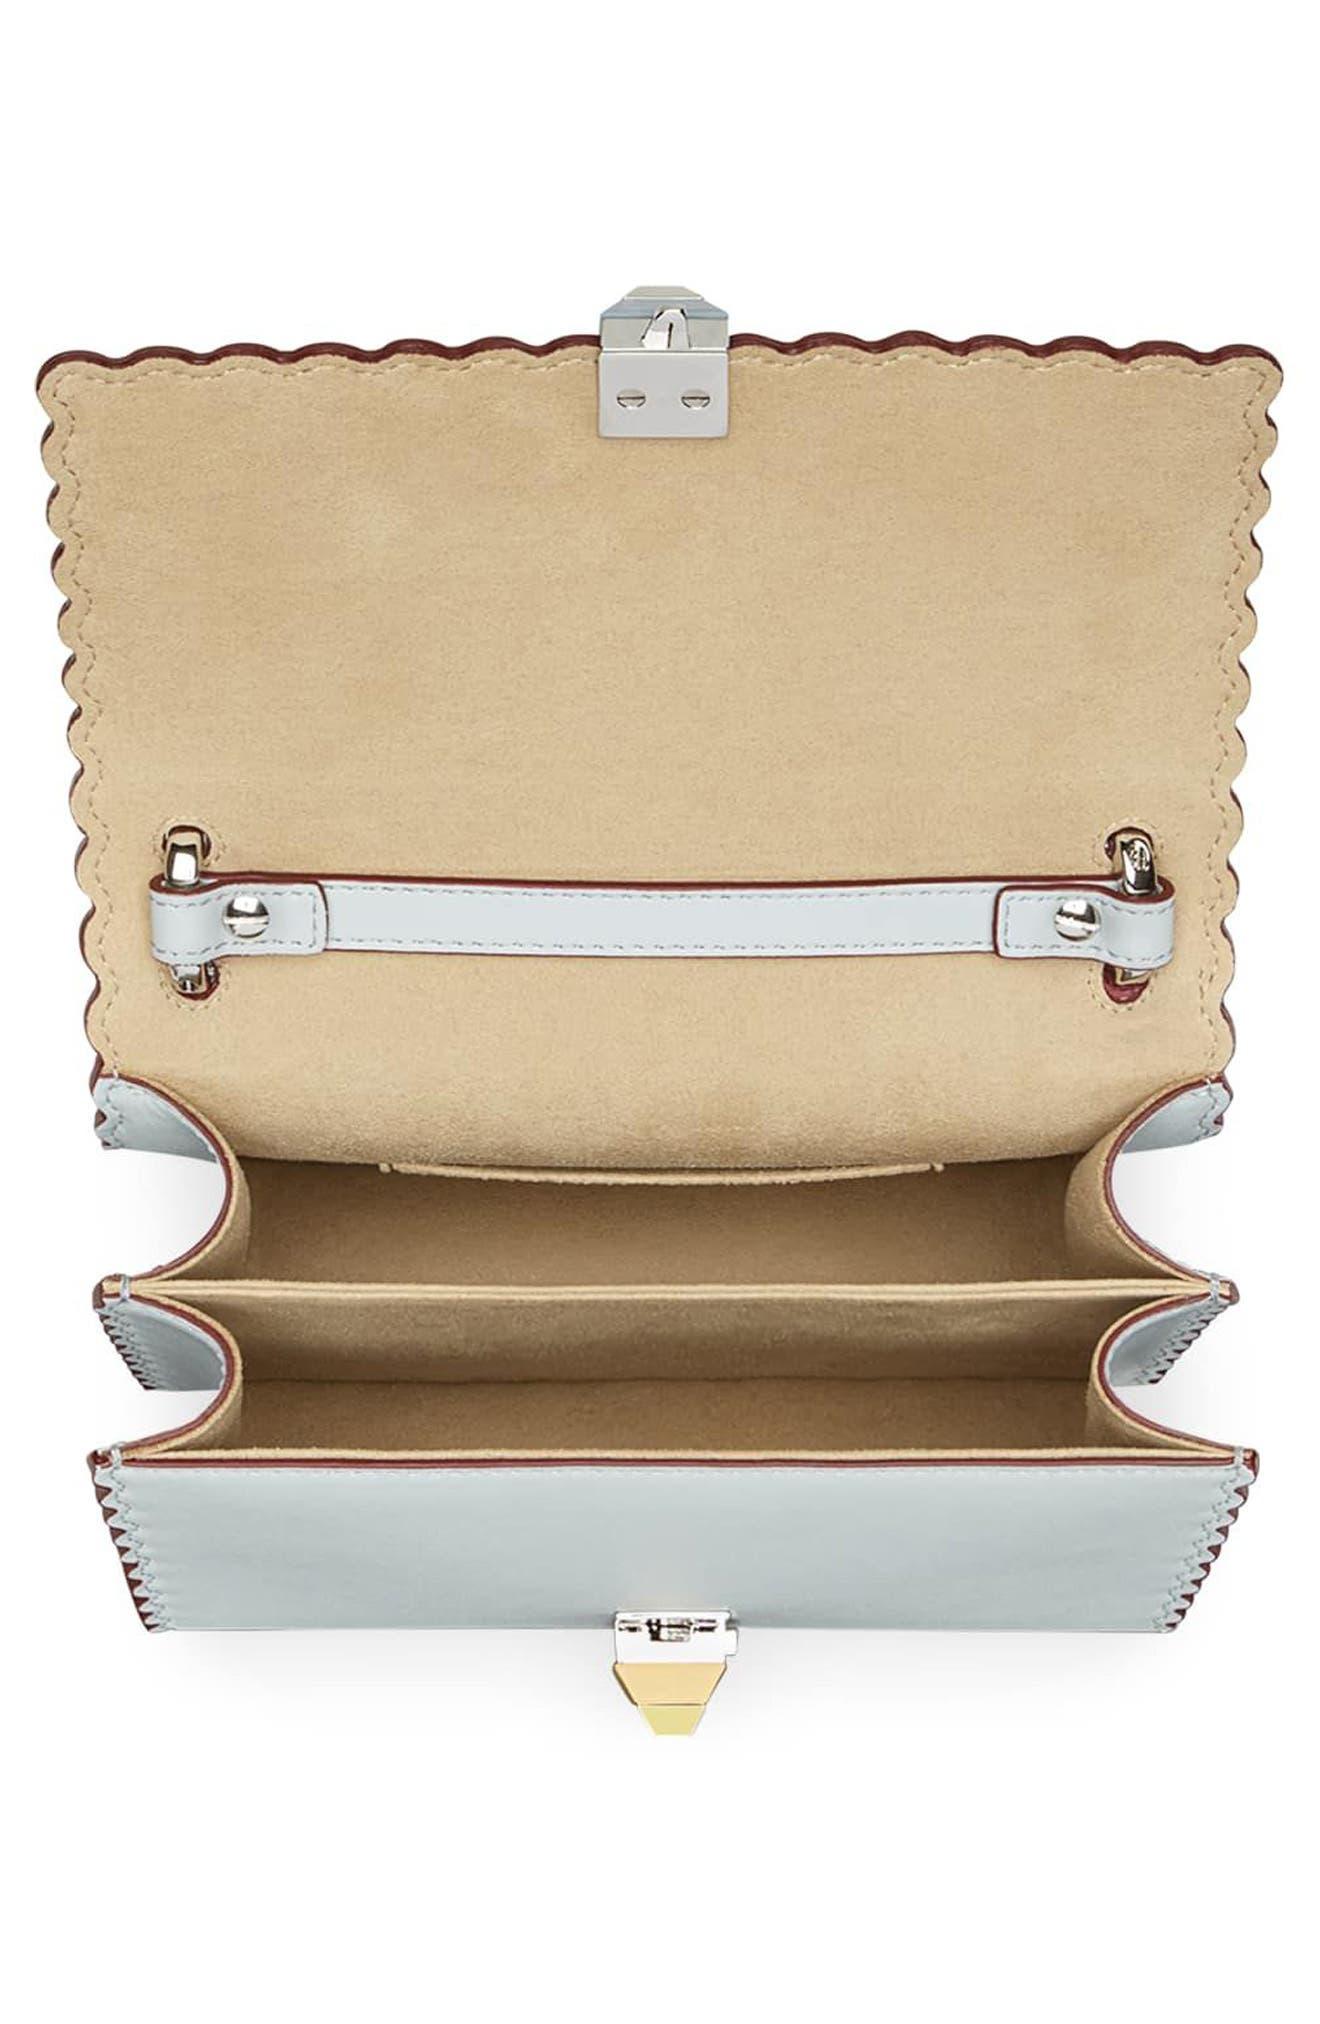 Mini Kan I Scalloped Leather Shoulder Bag,                             Alternate thumbnail 3, color,                             Grigio Perla/ Palladio